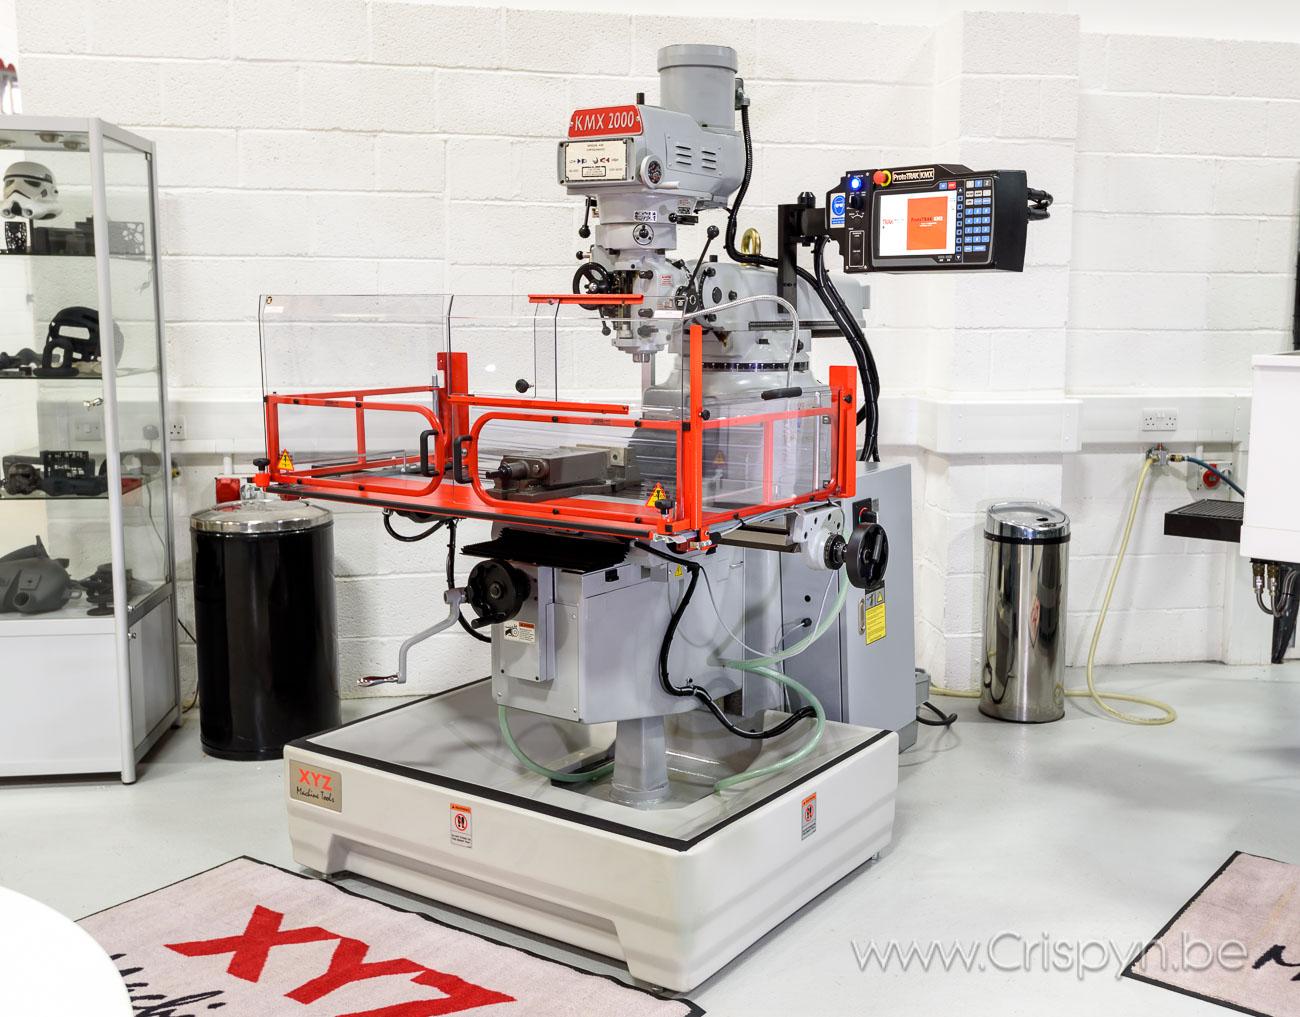 ProtoTRAK, Spindelmotor 2.25 kw Koersen xyz: 762 x 380 x 400 mm Tafel: 1270 x 254 mm